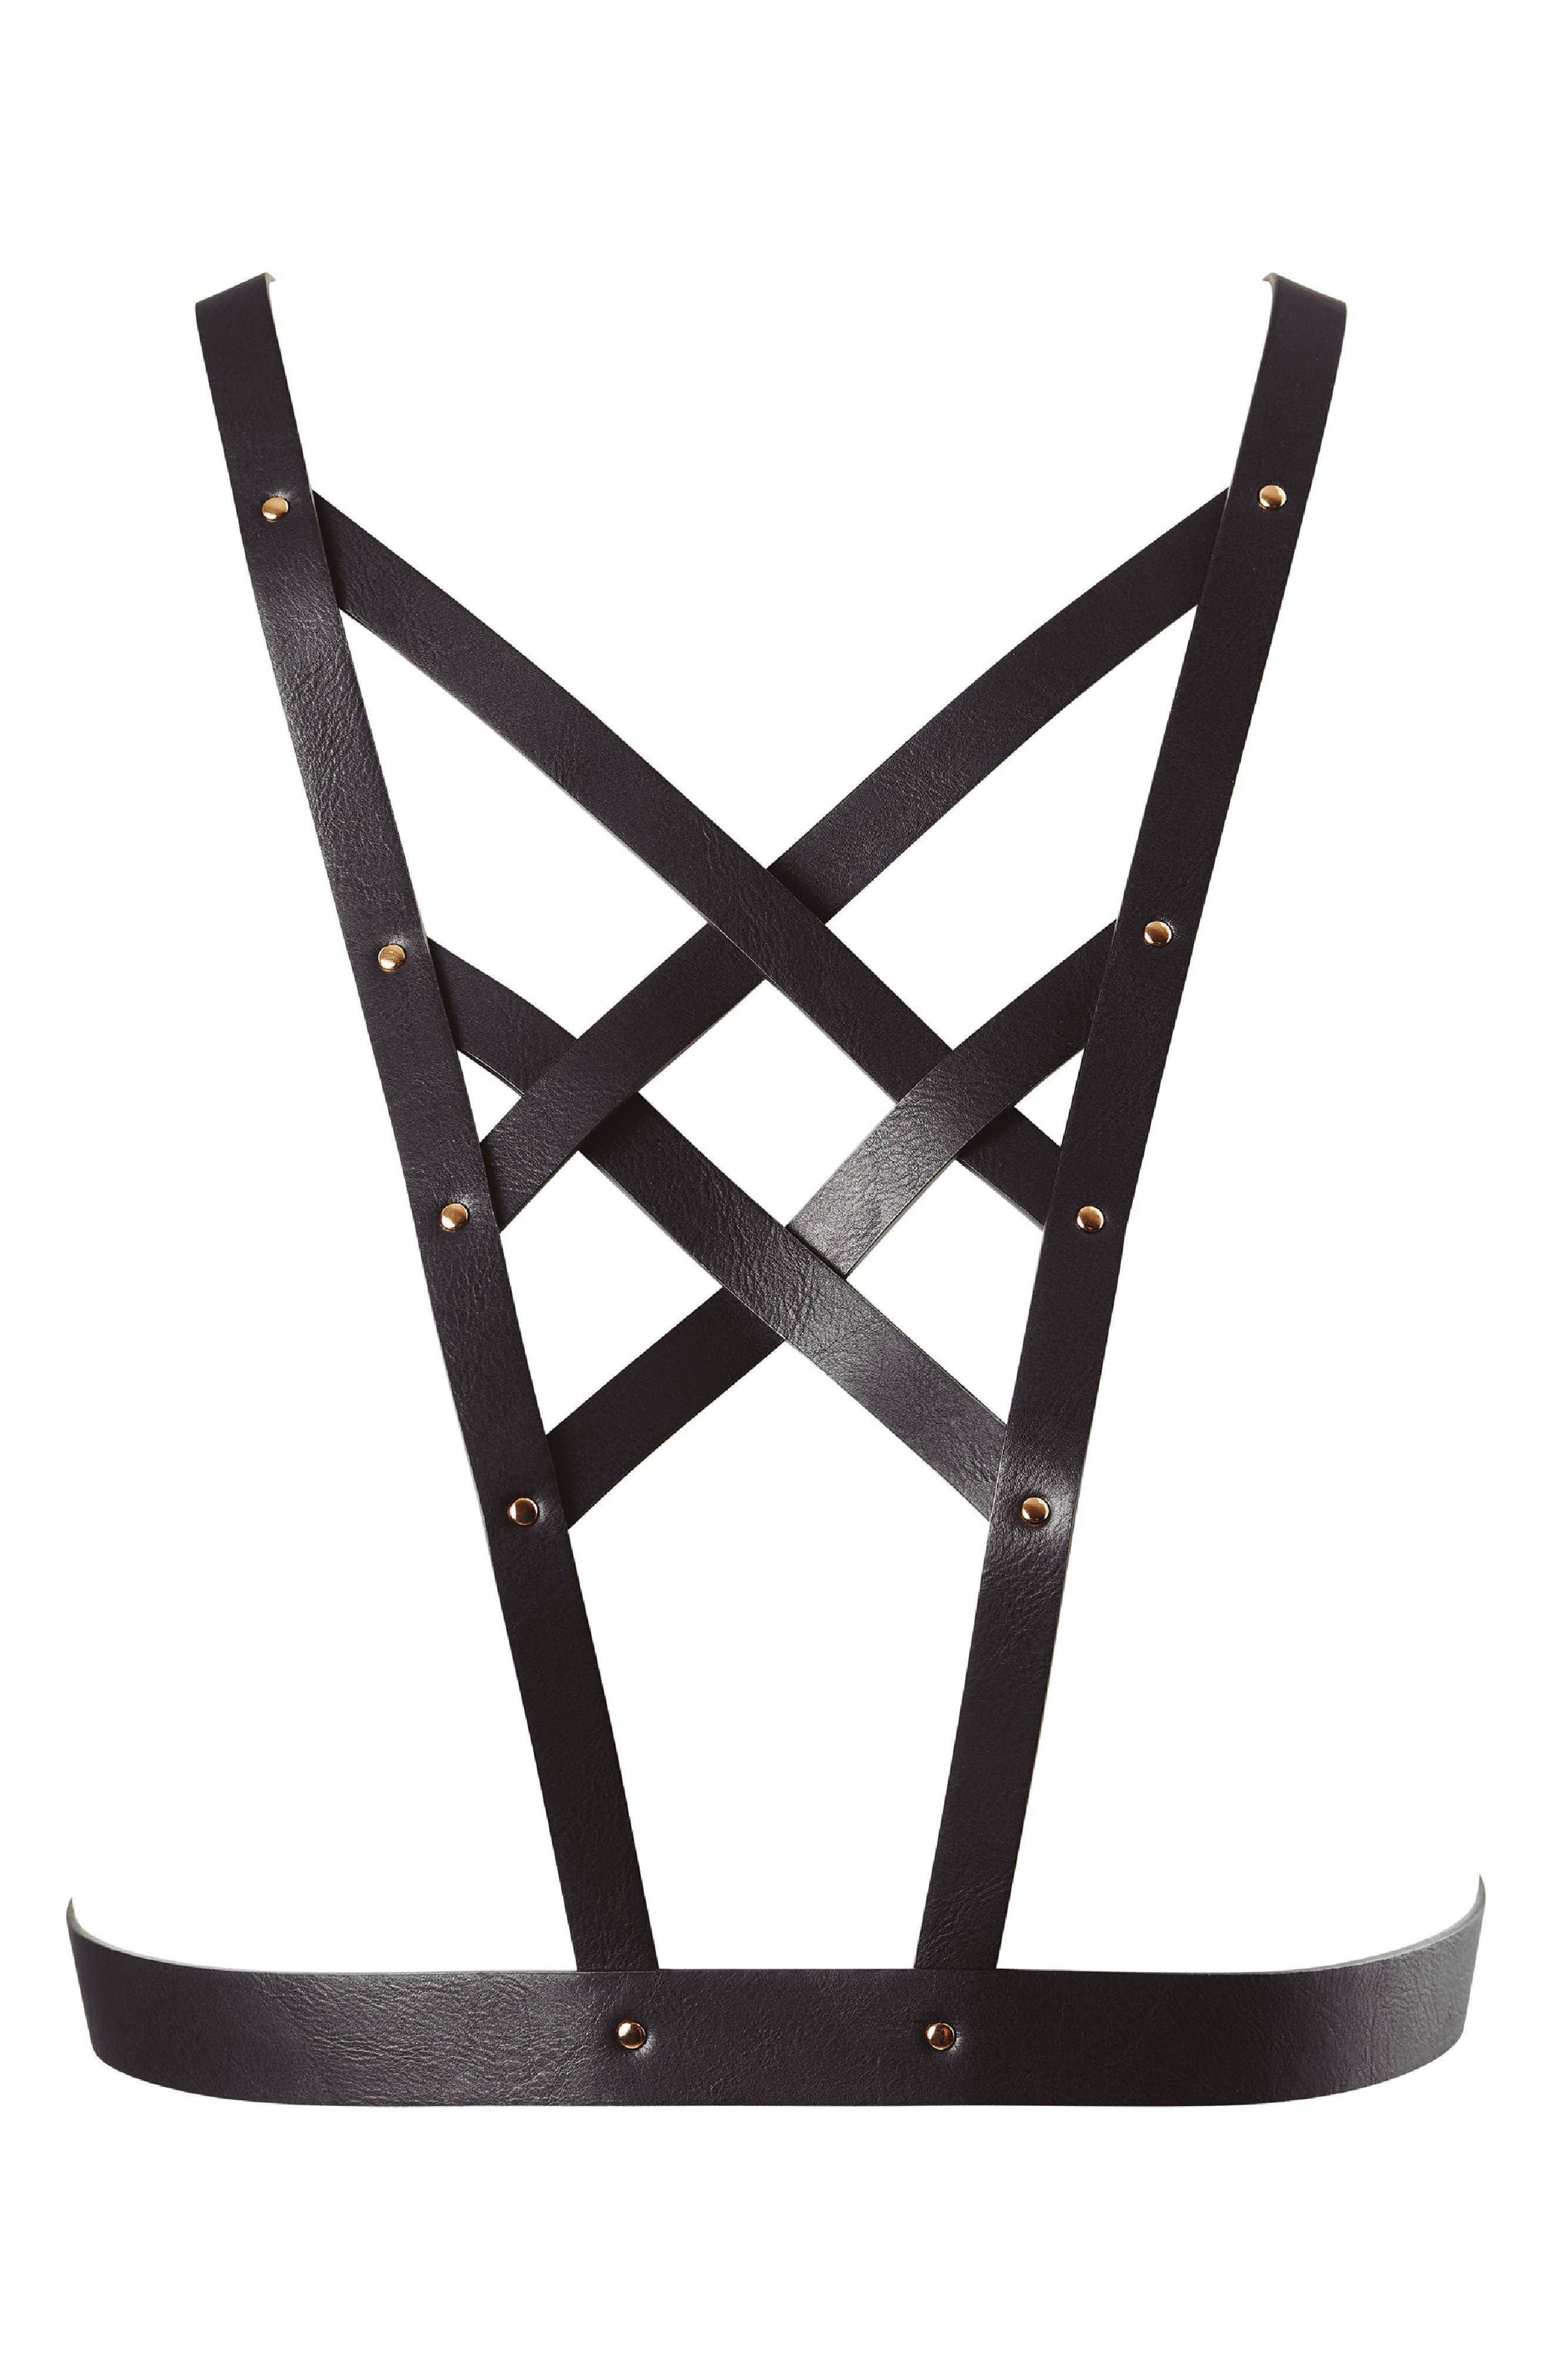 BIJOUX INDISCRETS Maze Cross Front Harness, Main, color, 003